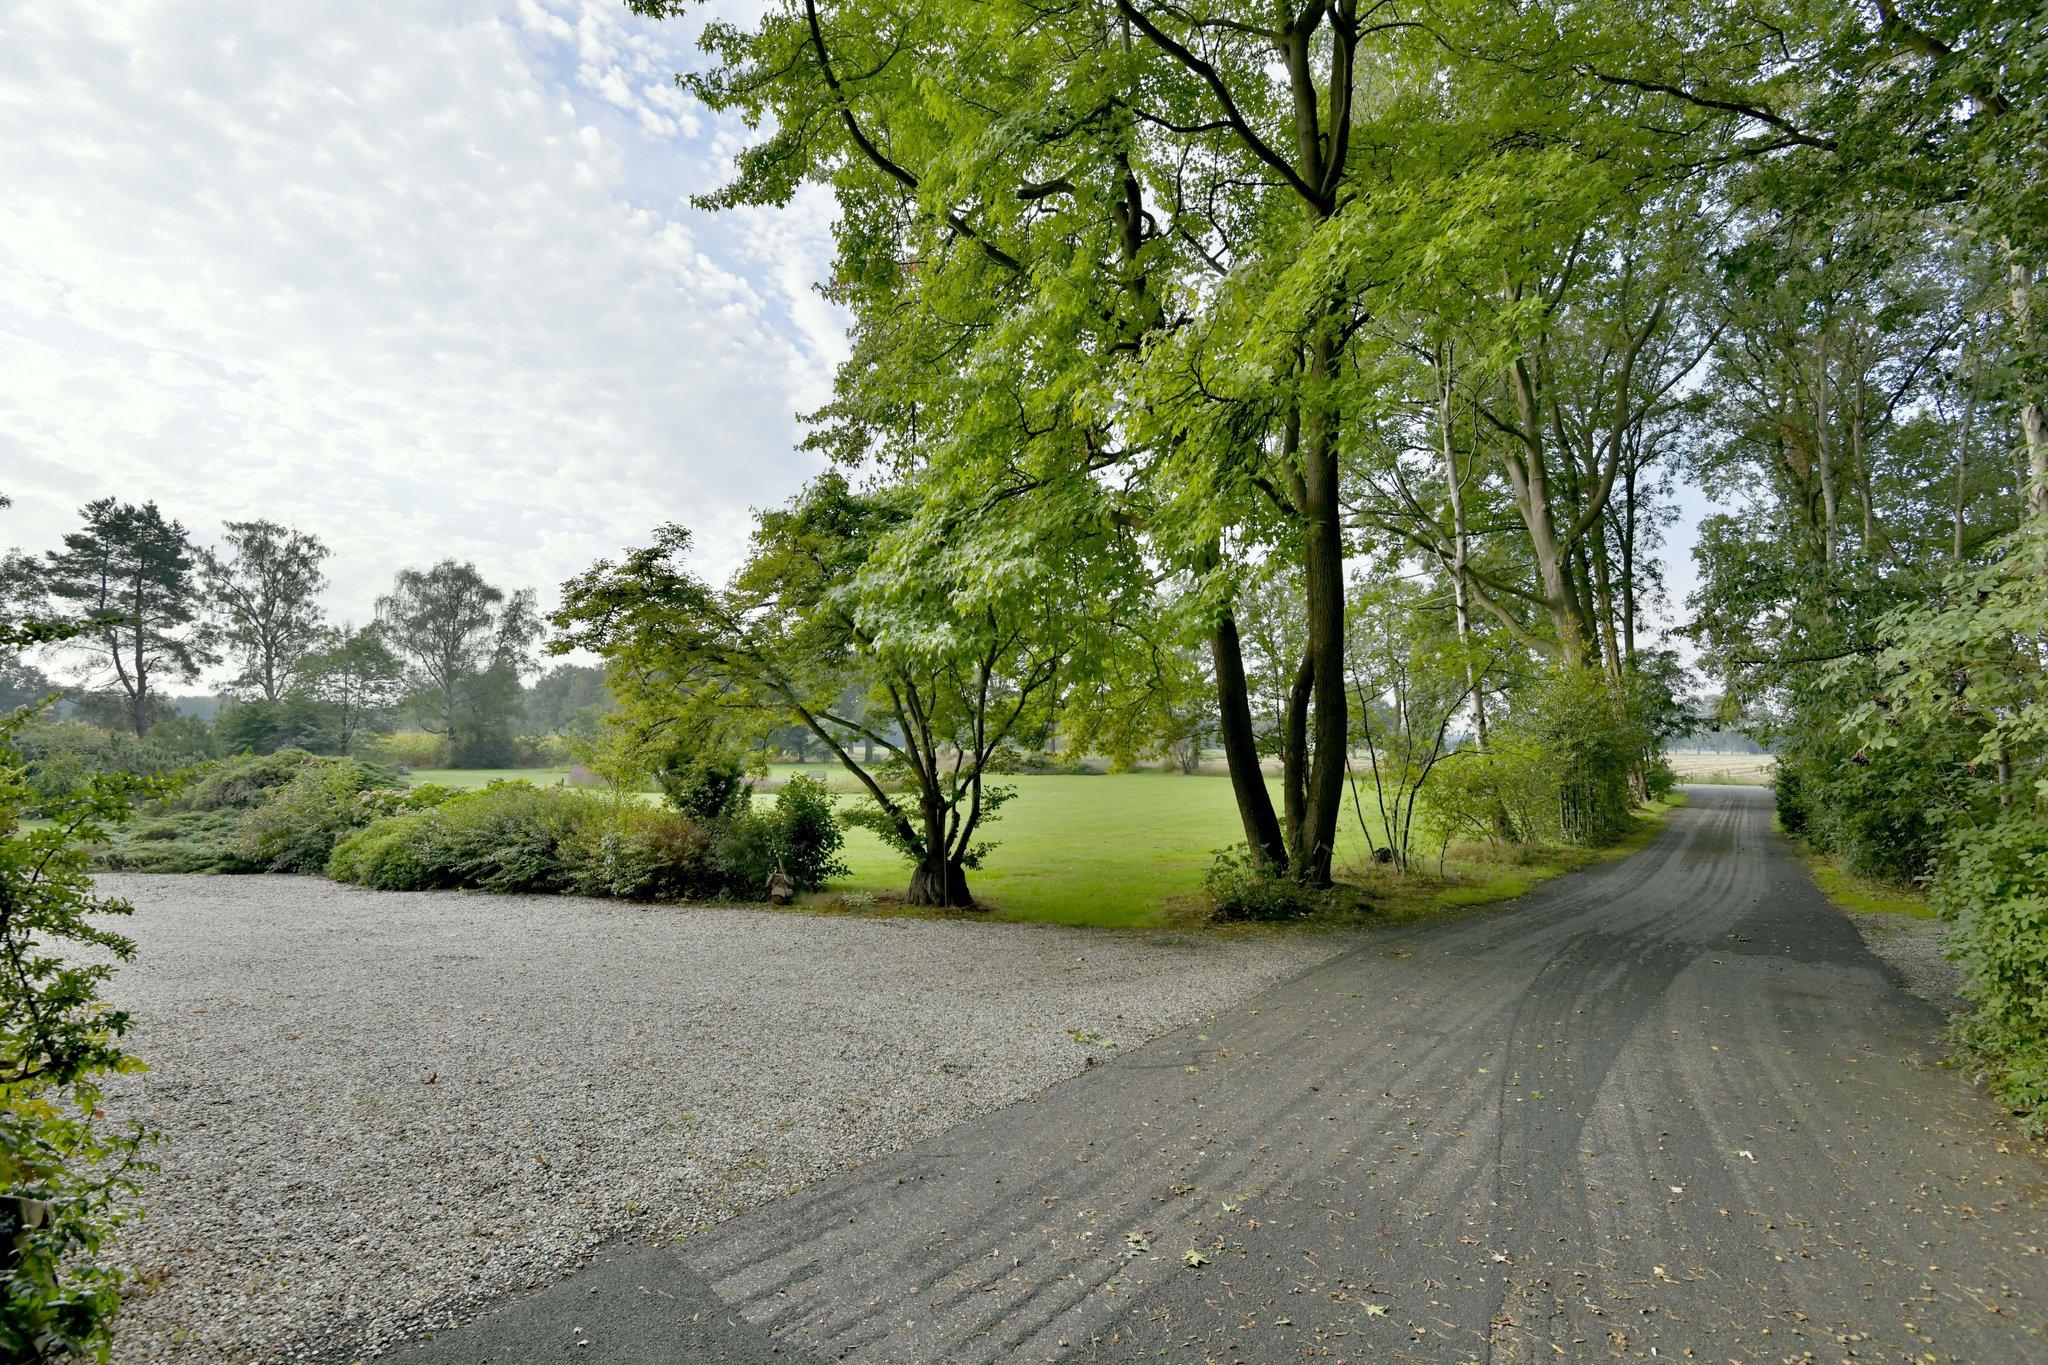 harfsen-schepersweg-3679737-foto-5.jpg